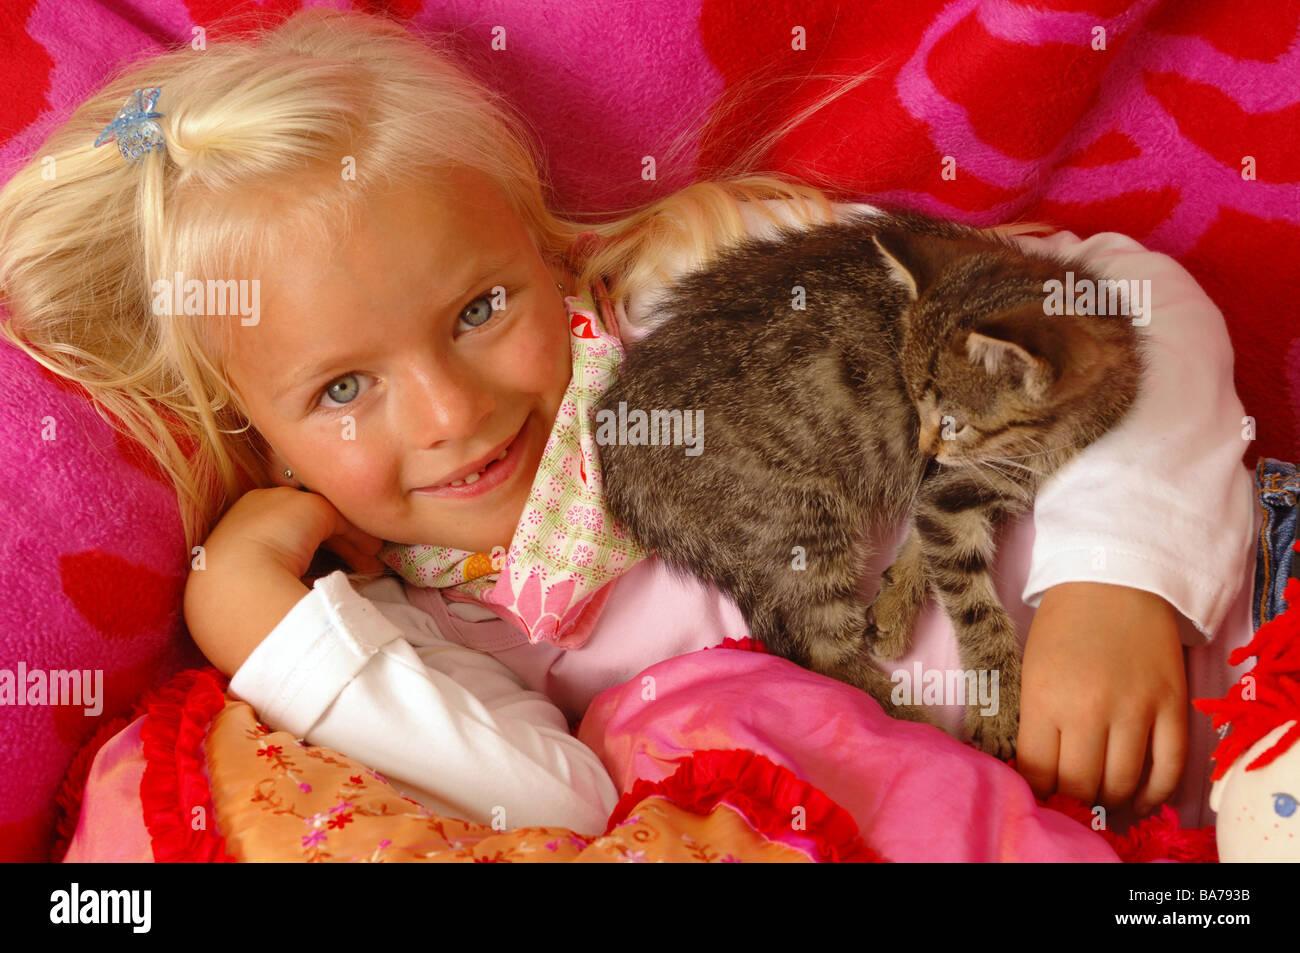 Girls smiles kittens cuddles lies portrait series people 5 years child-portrait child toddler blond gaze camera childhood Stock Photo